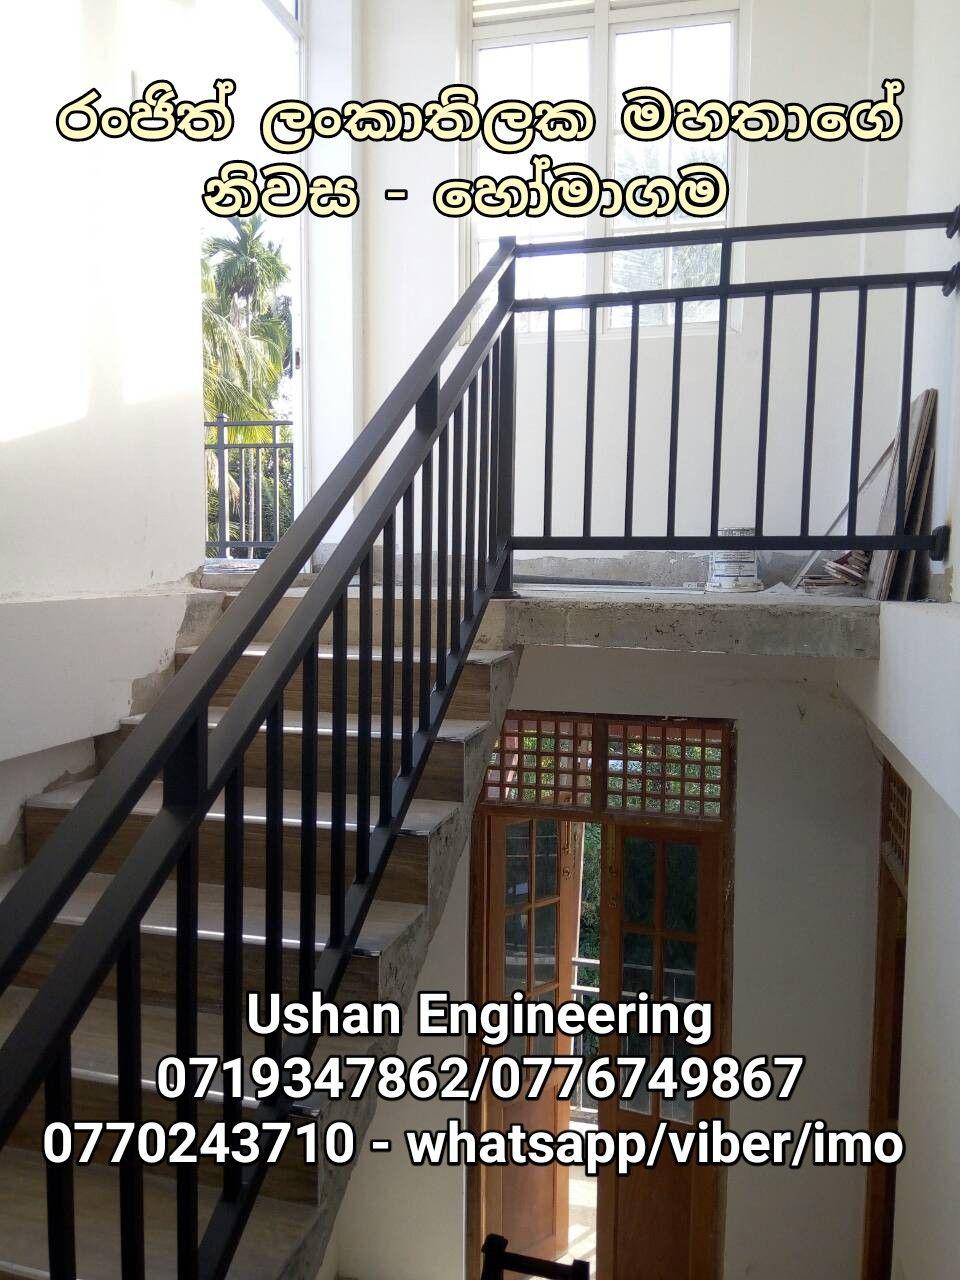 Pin On Handrail Sri Lanka Steel Handrail Sri Lanka Balcony Railing Sri Lanka Stair Cases Metal Balcony Railing Metal Hand Railing